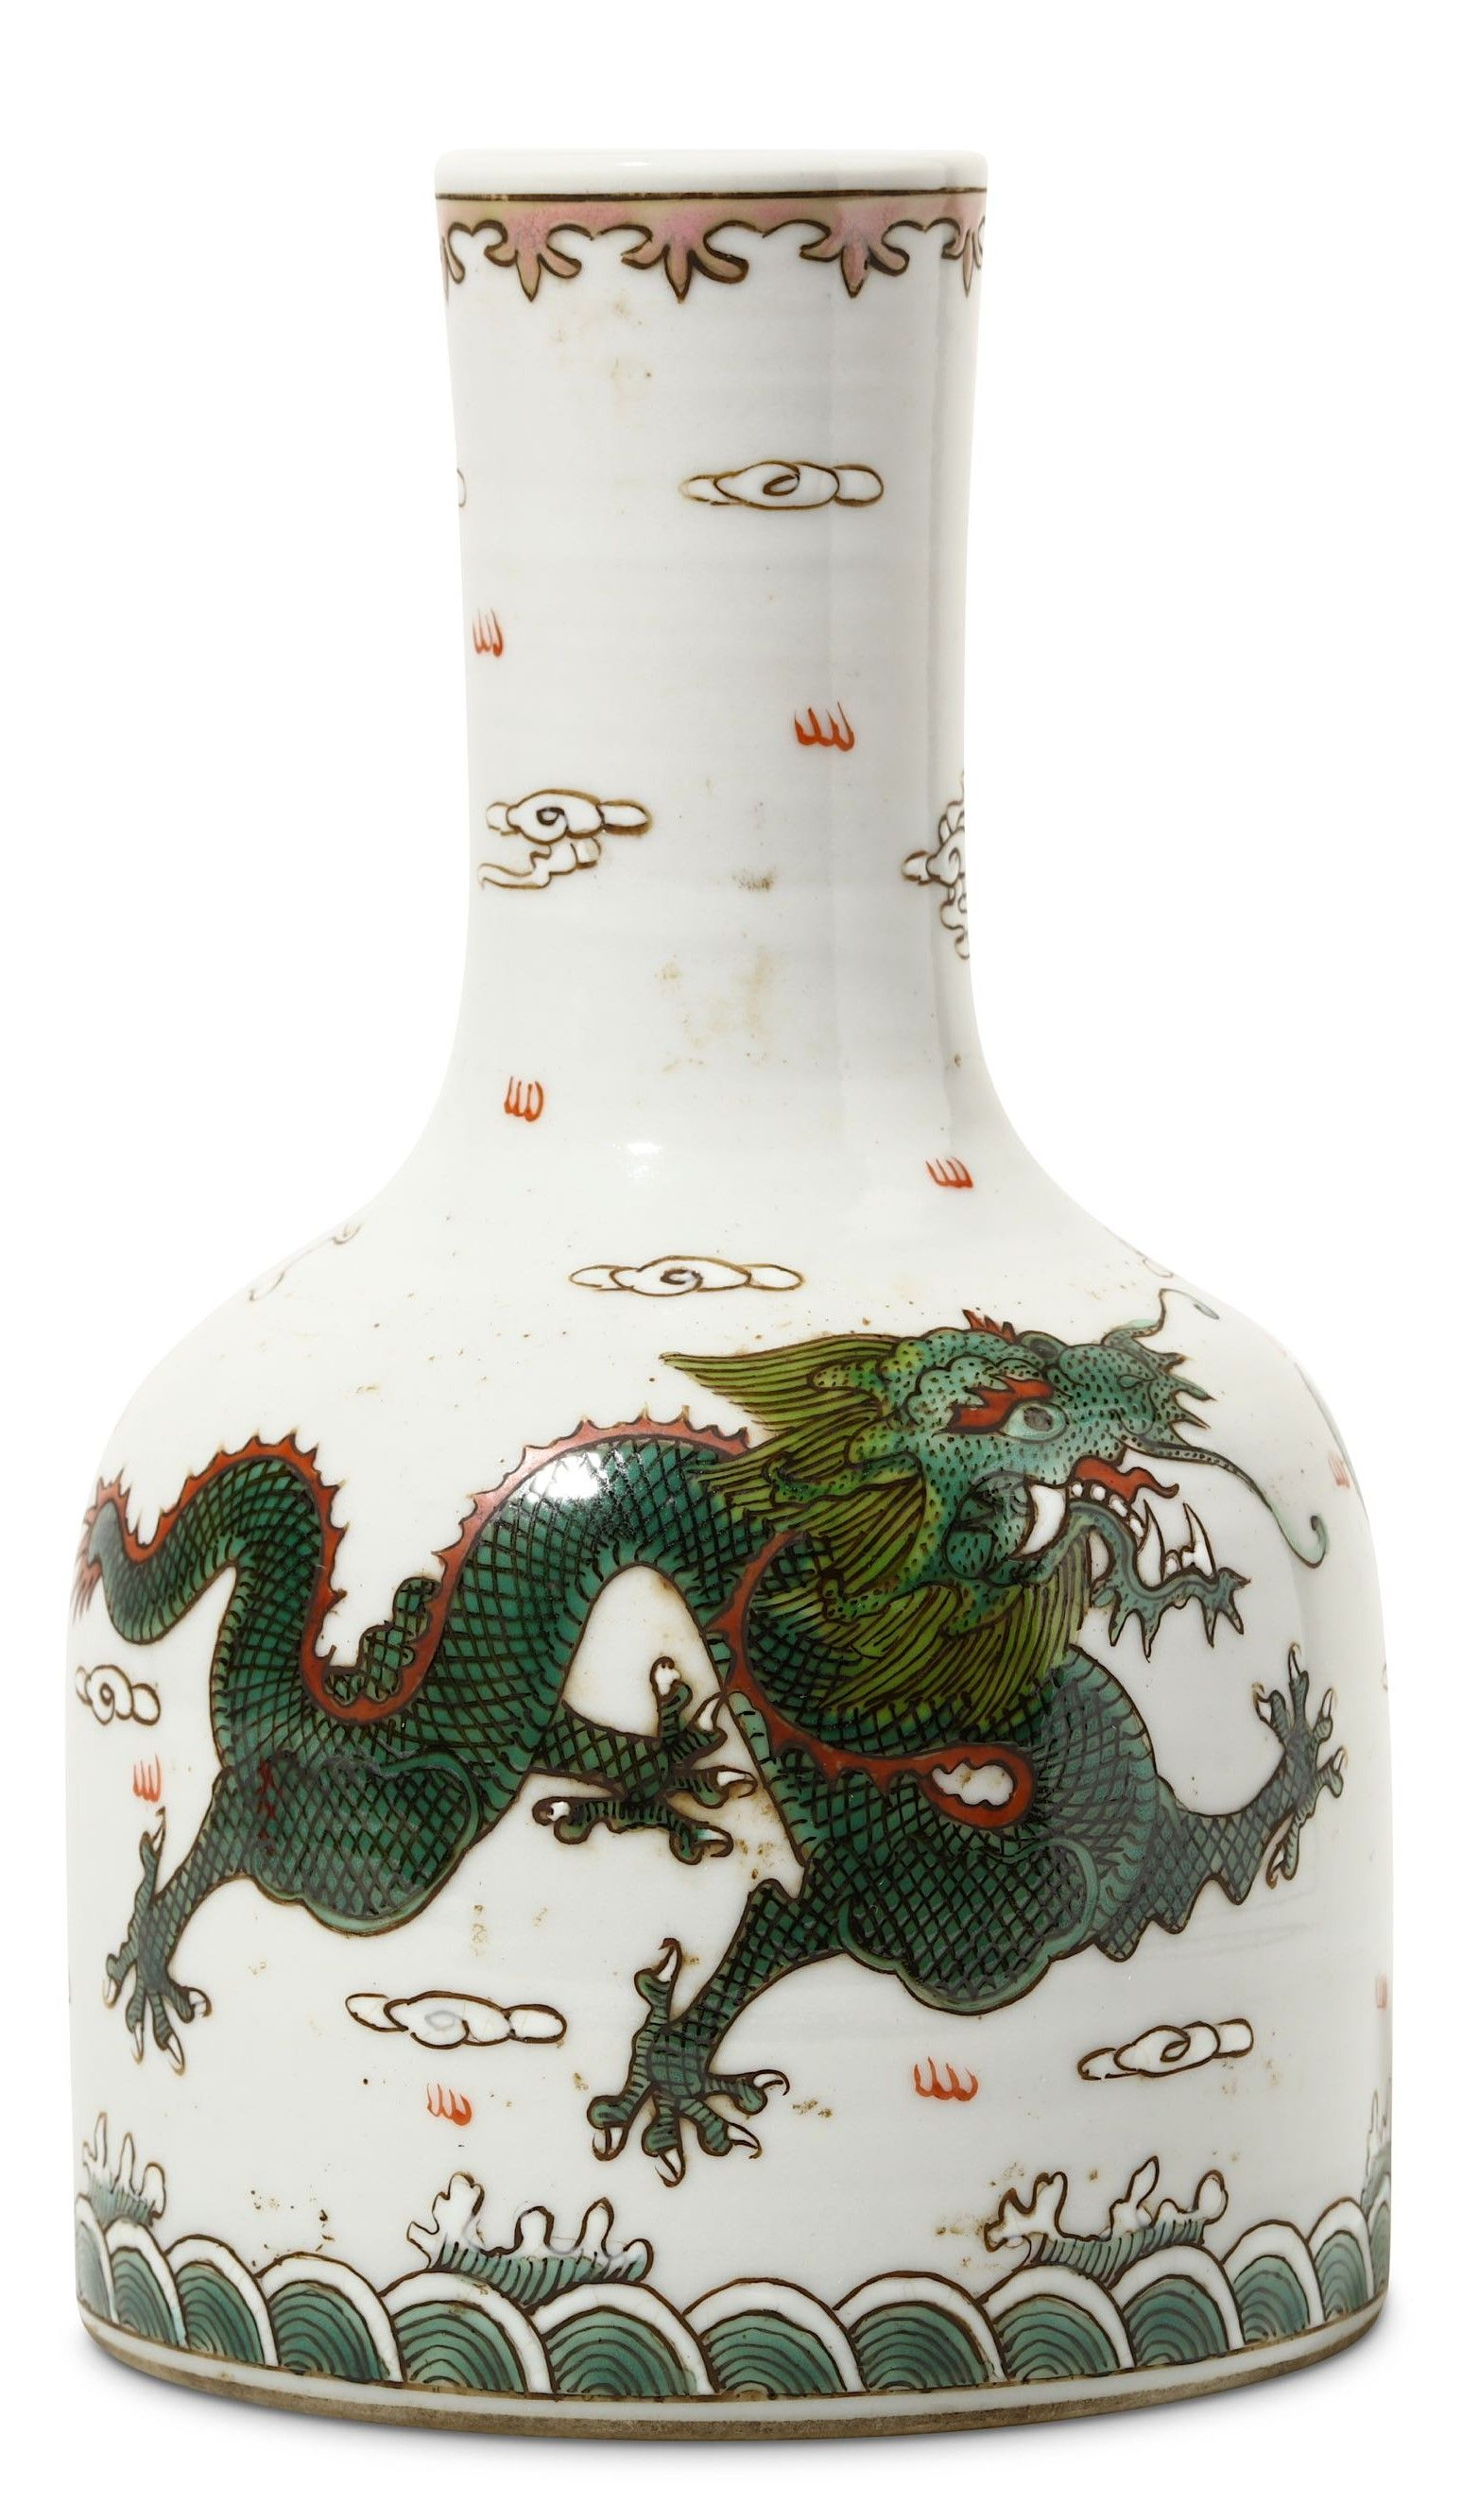 Famille Verte Dragon mallet Vase | Qing Dynasty - Guangxu mark | #dragon #dragons #art #antique #ceramic #ware #Jingdezhen #stoneware #porcelain #pottery #auction #history #poterie #céramique #sculpture #celadon #antiquité #brocante #stoneware #museum #sancai #nankin #dynasty #tang #ming #song #tong #yuan #Qianlong #qing #Cizhou #meiping #imperial #period #chine #drachen #drache #drago #Japan #meiji #satsuma #Shenlong #Tianlong #Qiulong #Panlong #longshan #ryū #龍 #竜 #龙